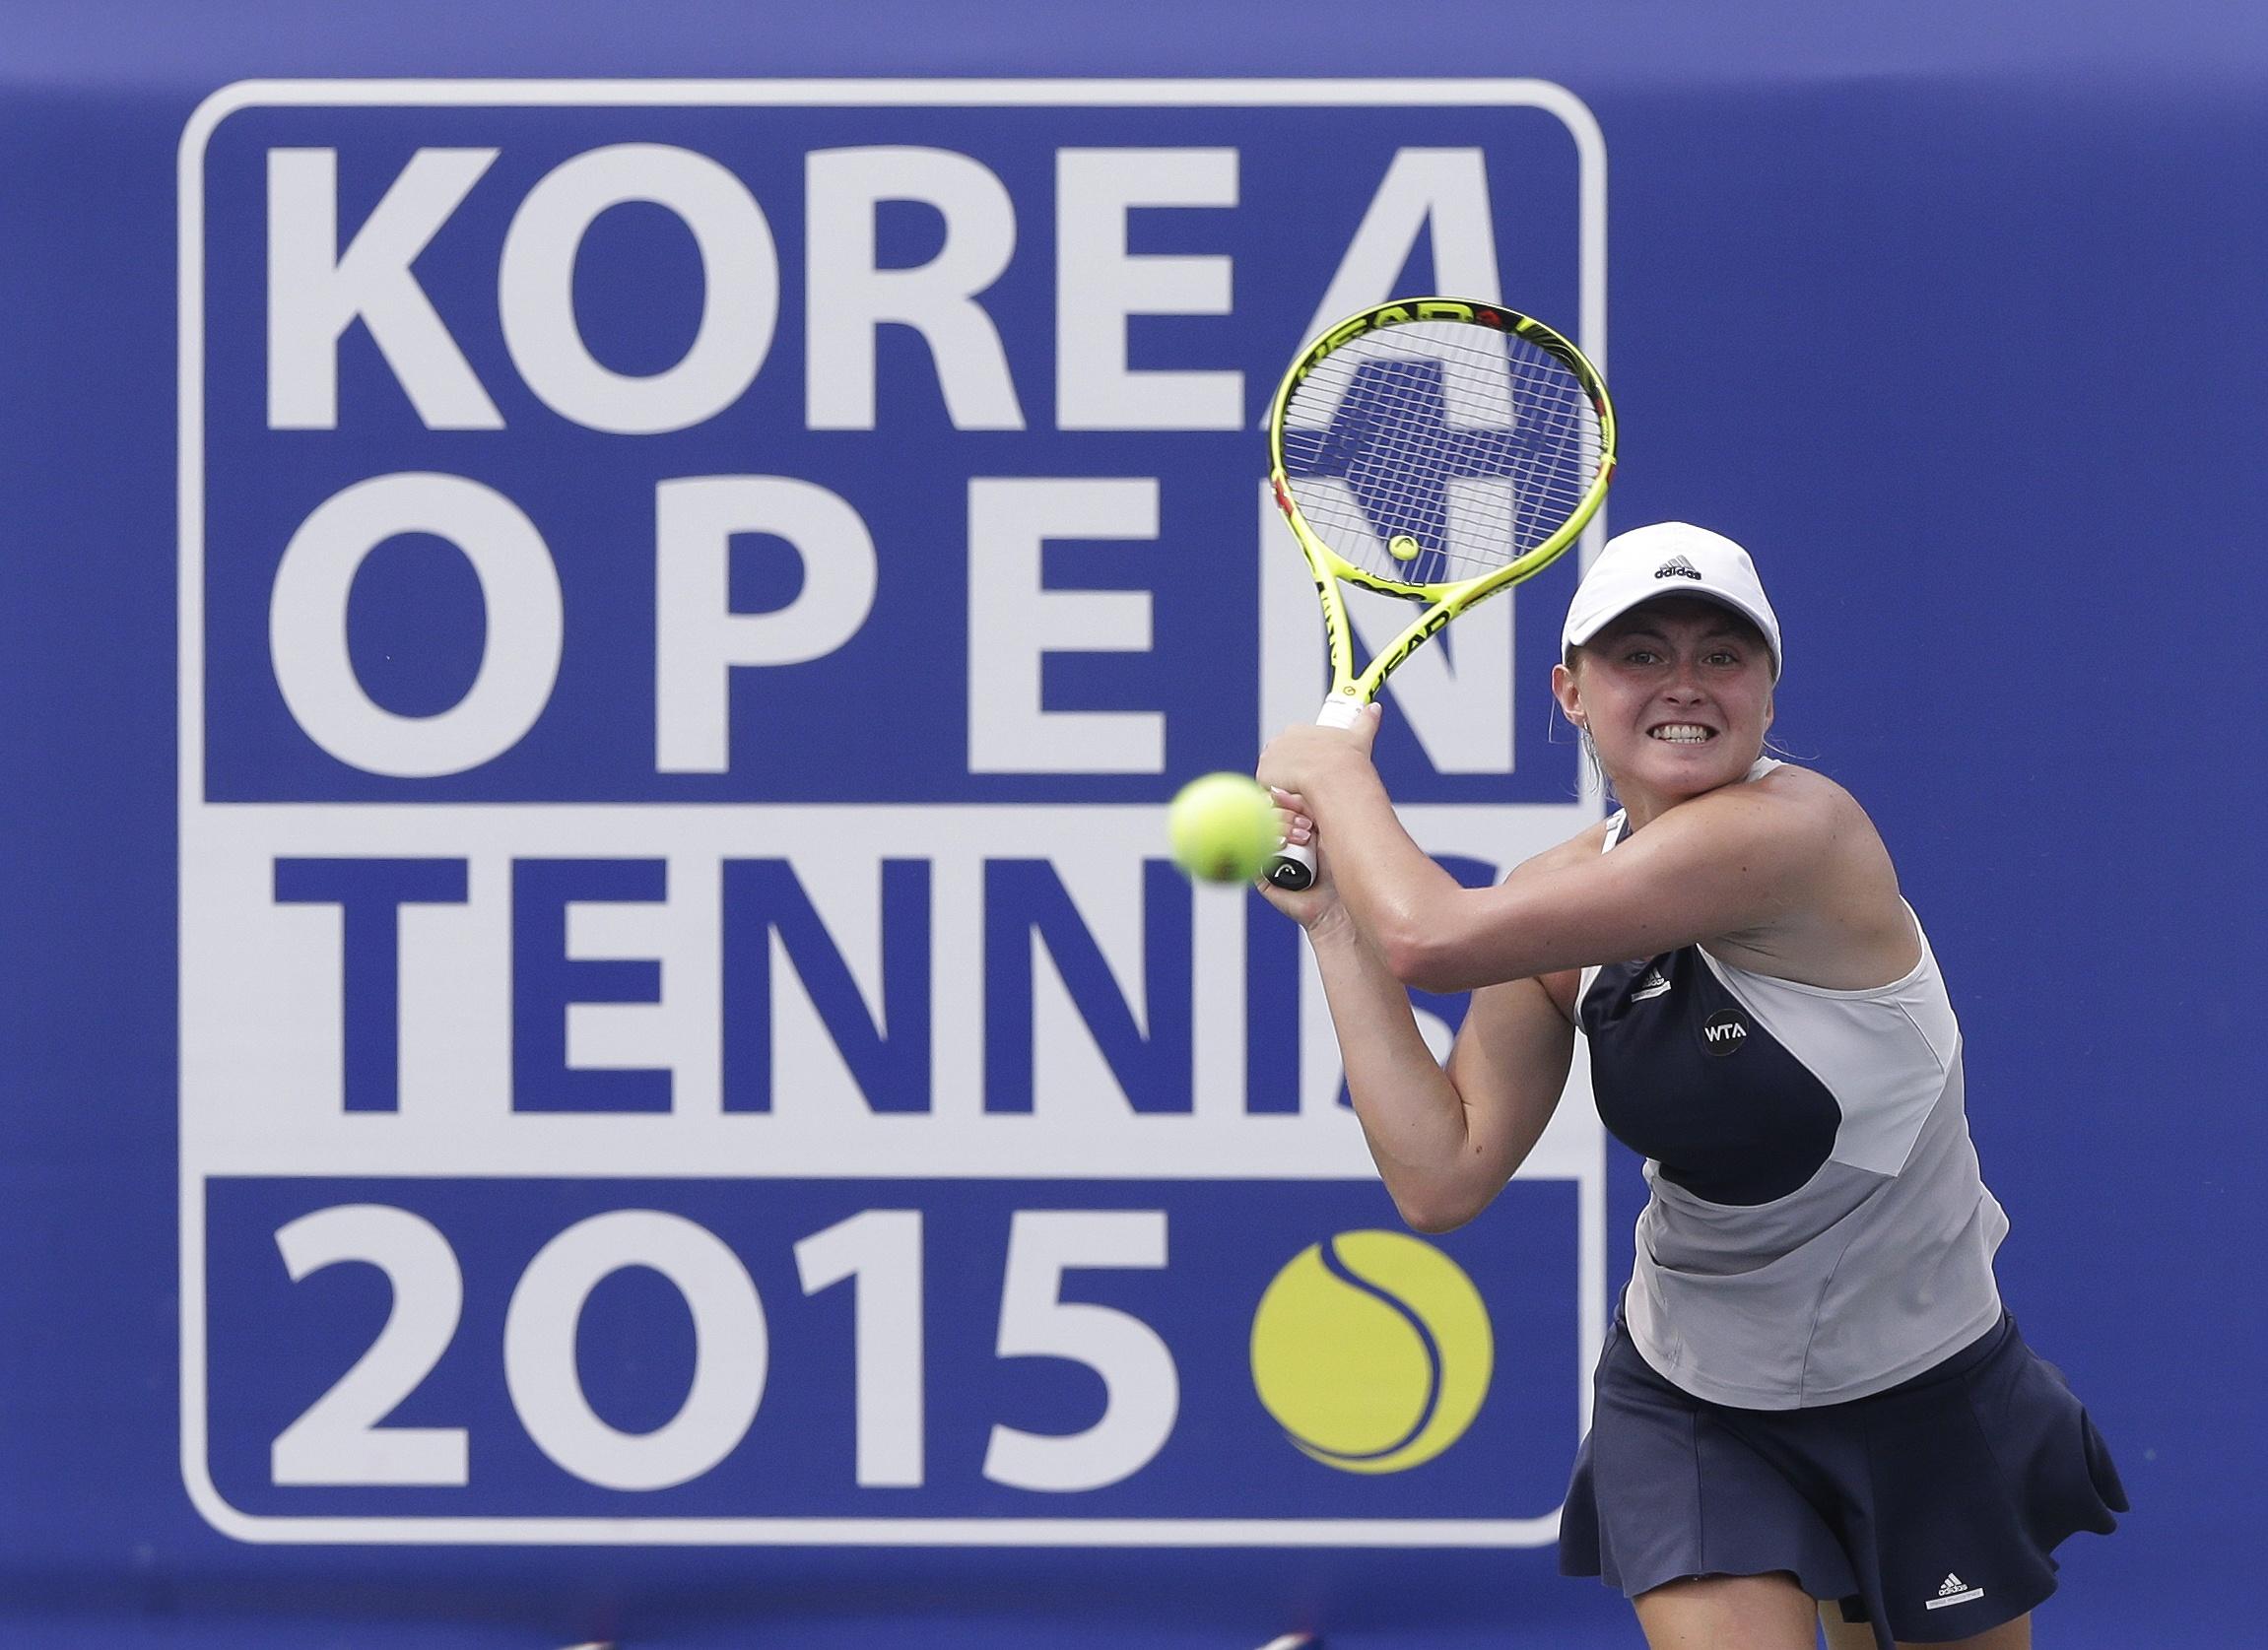 Aliaksandra Sasnovich of Belarus returns a shot against Anna Karolina Schmiedlova of Slovakia during the semifinal match of the Korea Open tennis championships in Seoul, South Korea, Saturday, Sept. 26, 2015. (AP Photo/Ahn Young-joon)